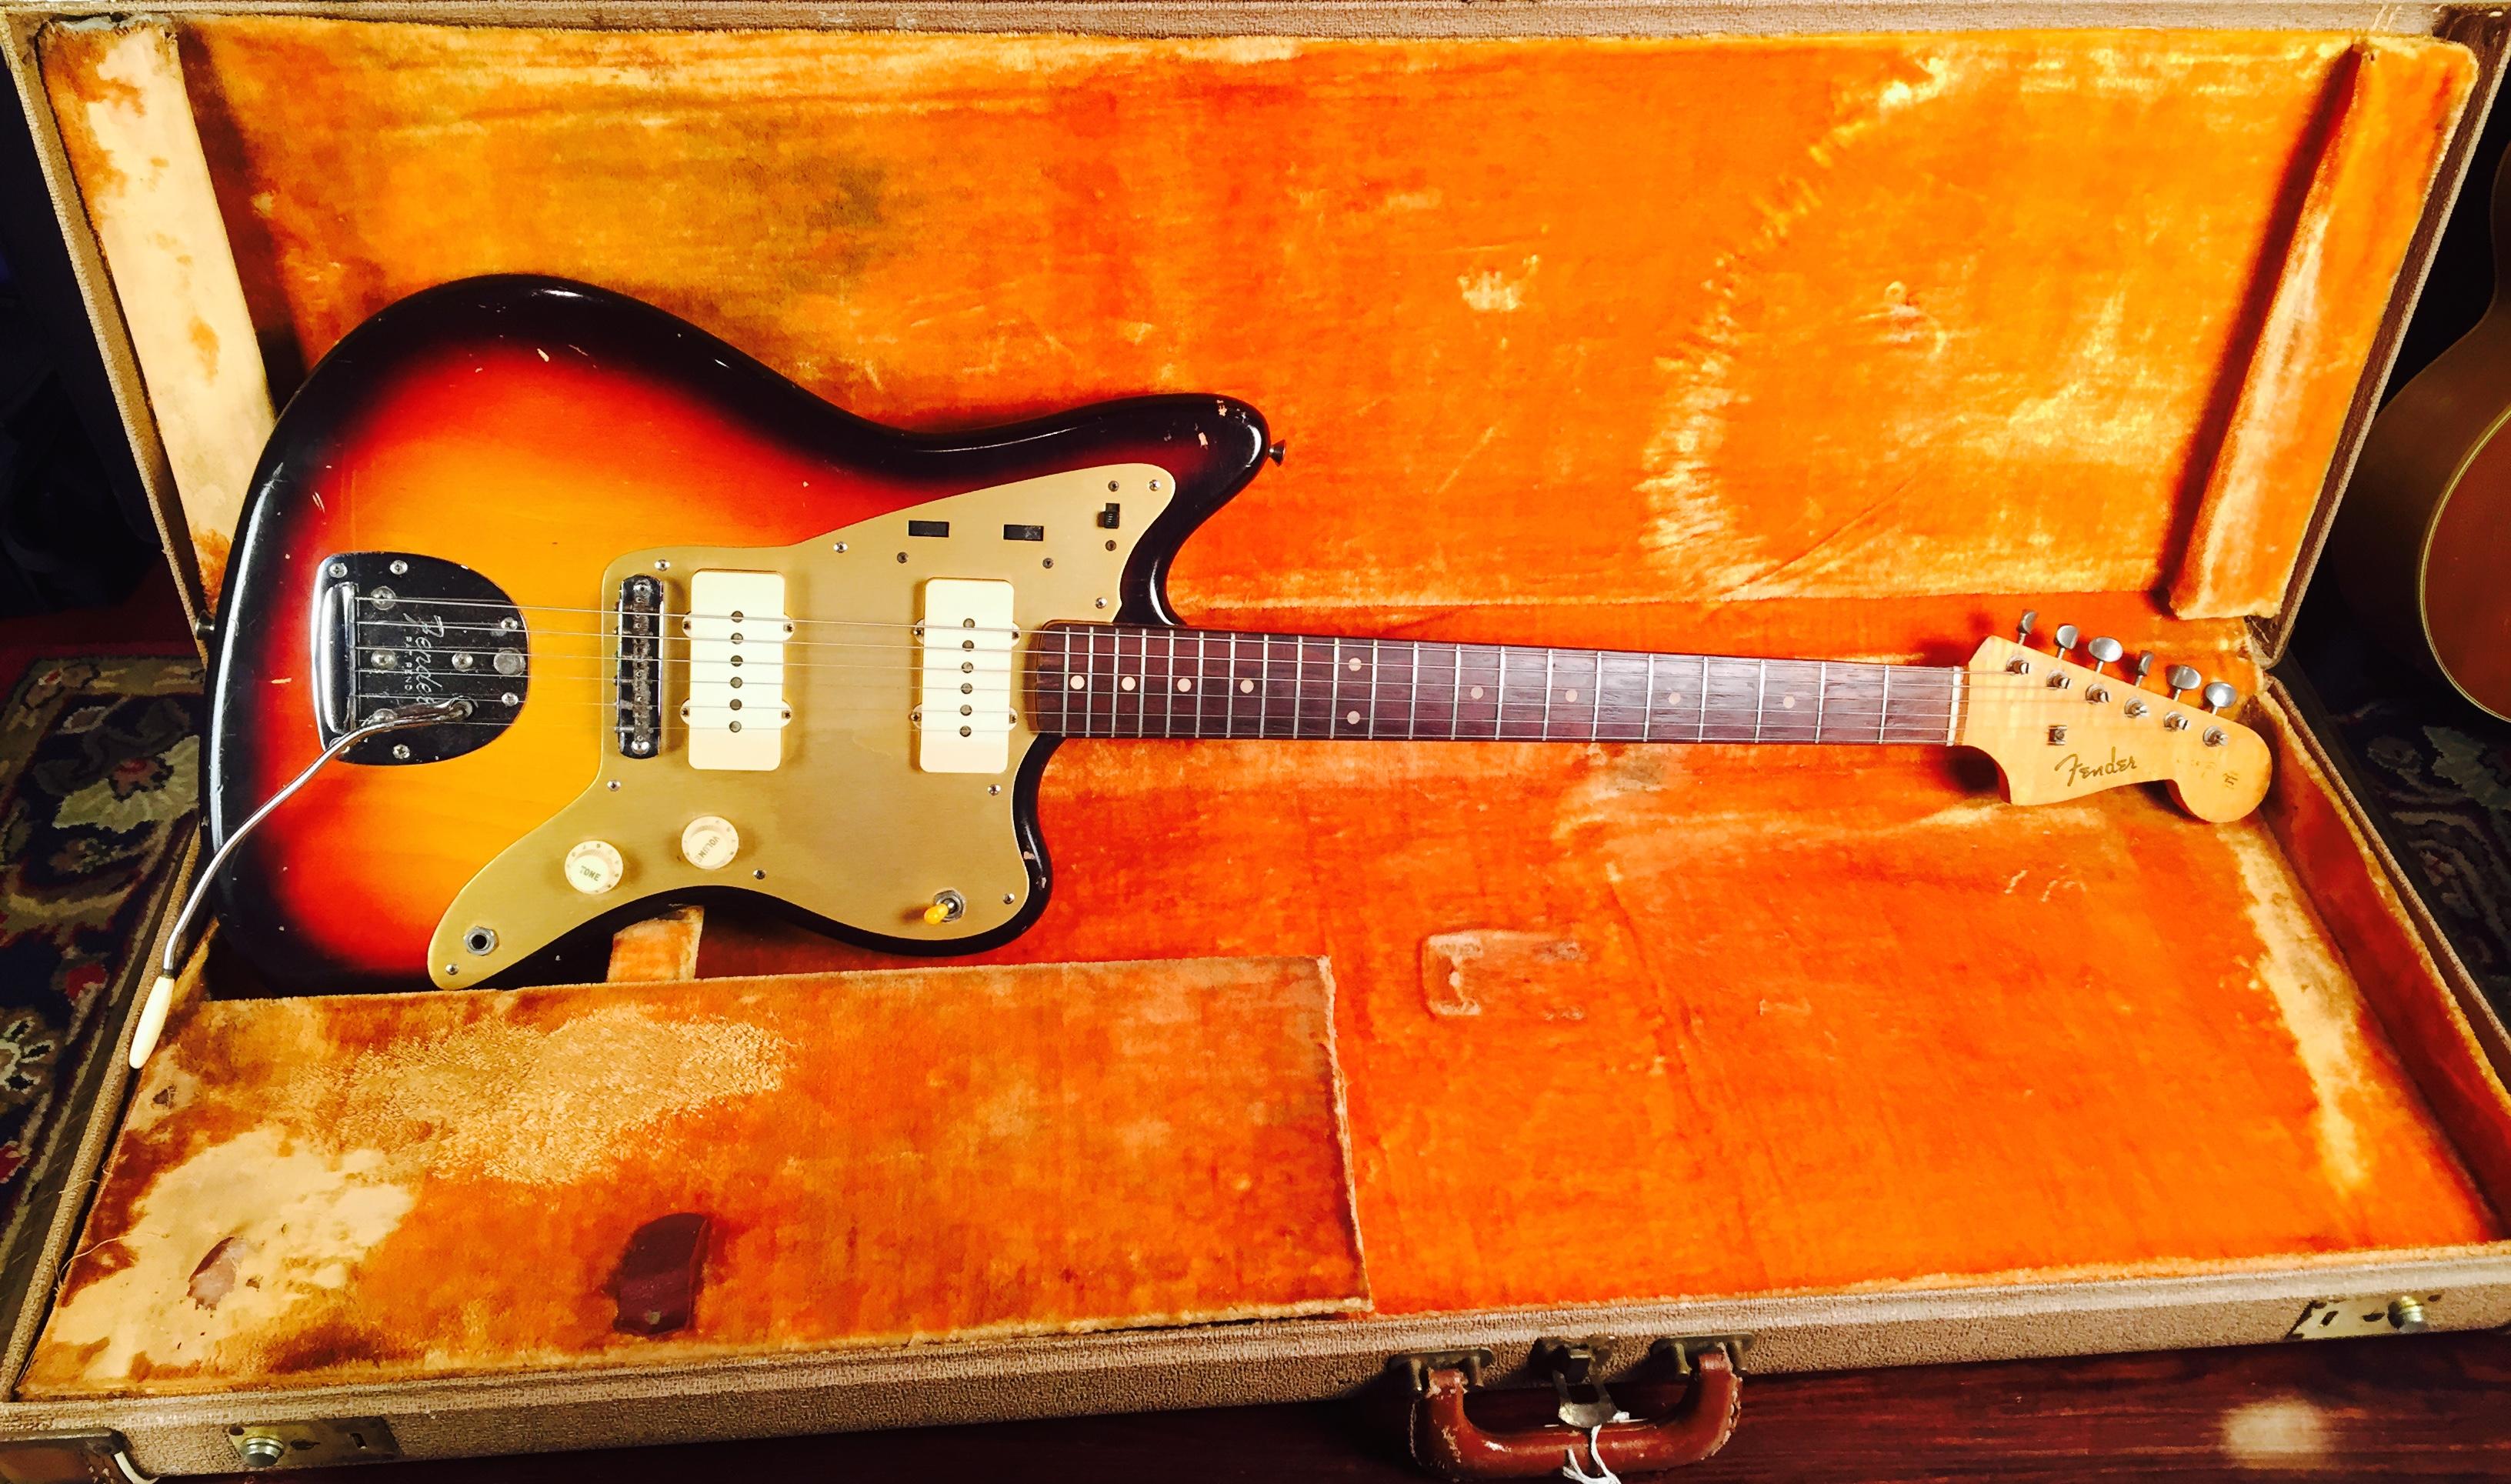 1959 Fender Jazzmaster Sunburst SN 36477